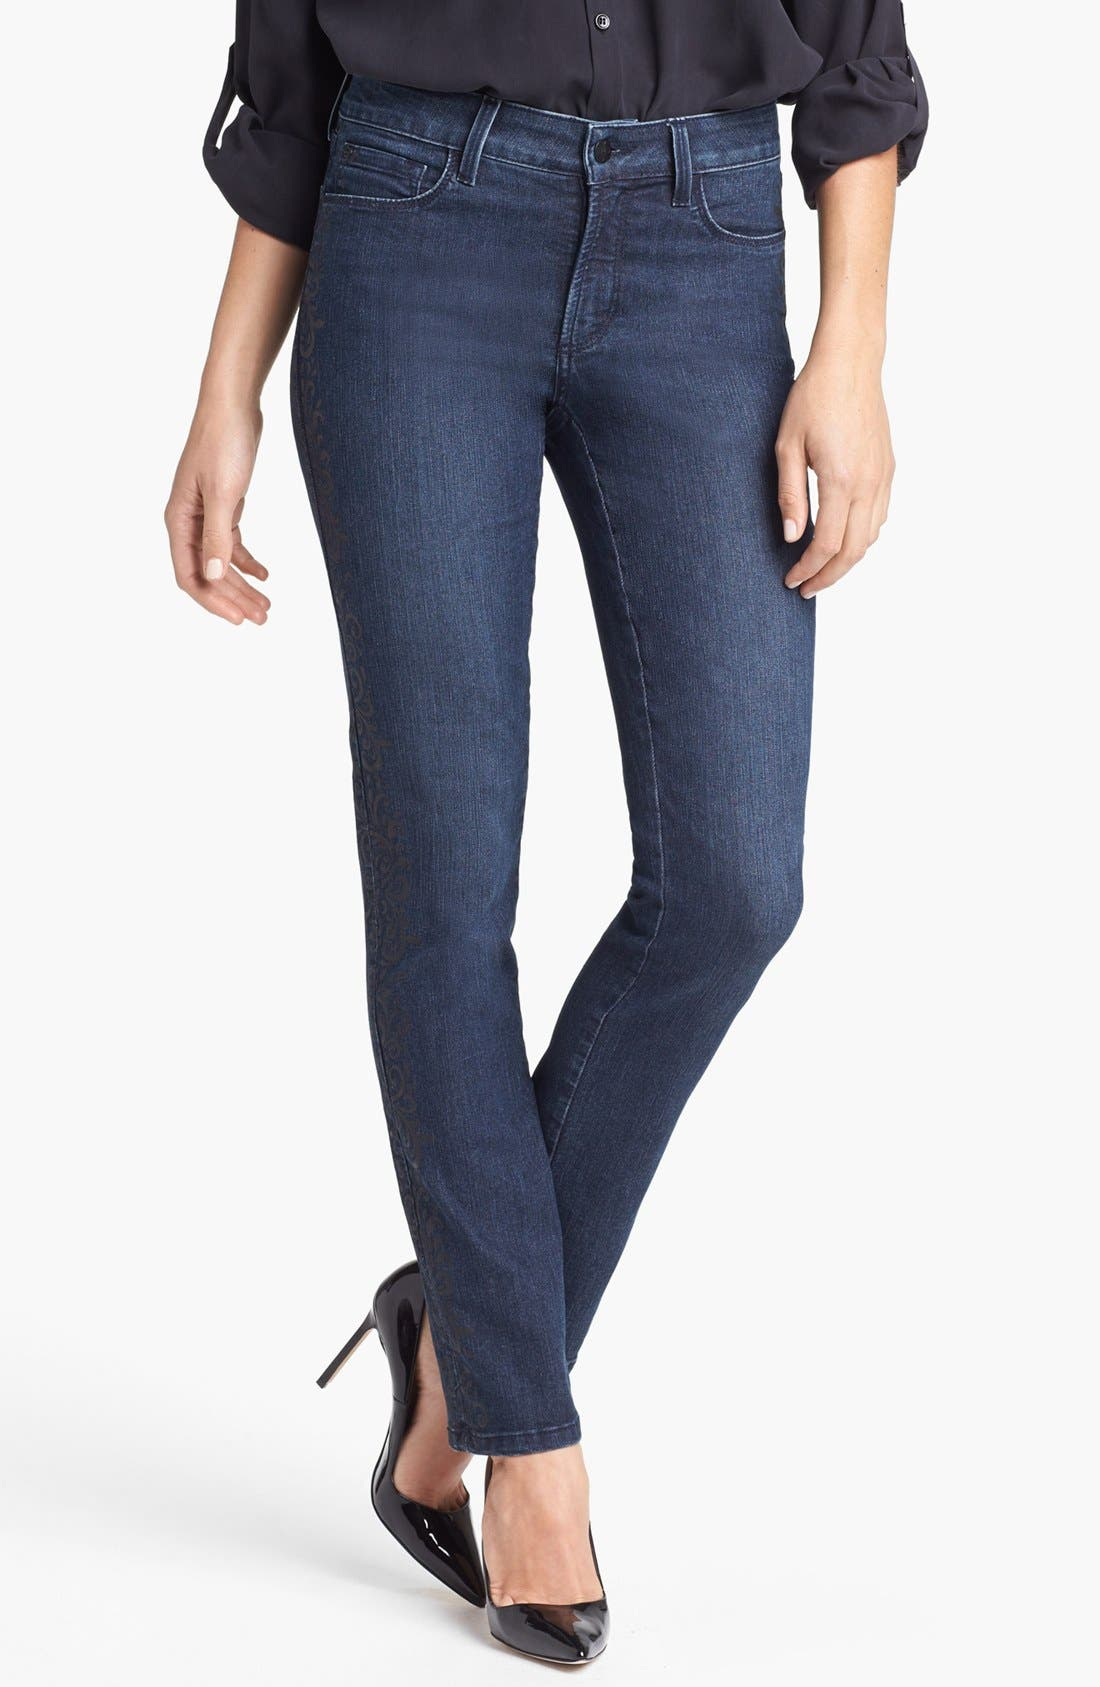 Alternate Image 1 Selected - NYDJ 'Sheri' Lace Detail Stretch Skinny Stretch Jeans (Old River)